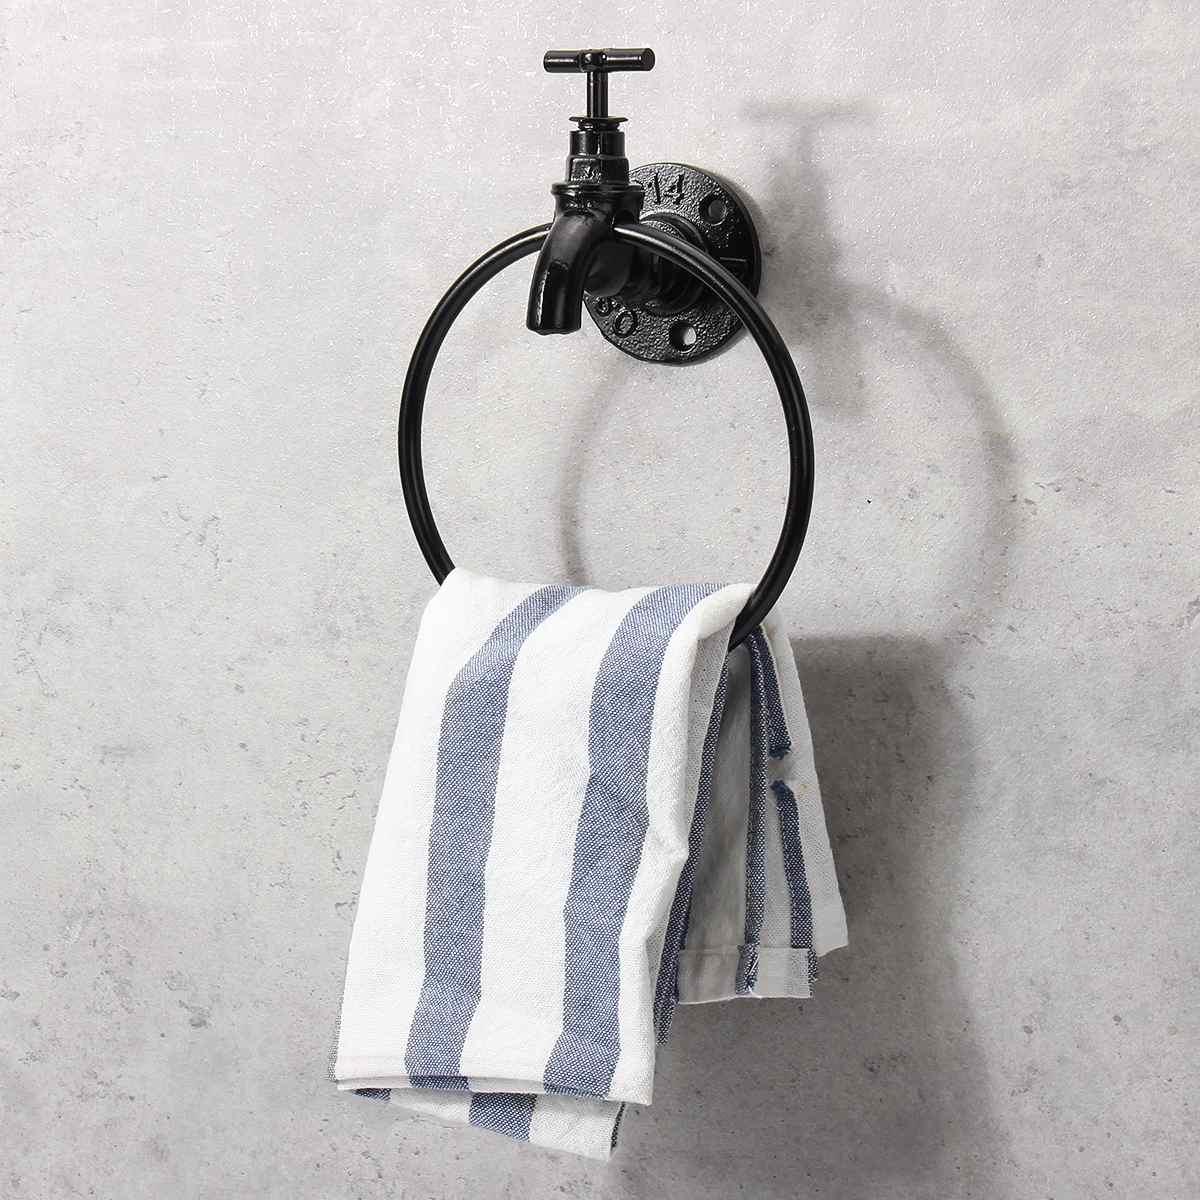 Industrial Wall Mounted Towel Ring Holder Retro Kitchen Bathroom Storage Rack Organizer Hanger Shelf Towel Holder Hardware Tools